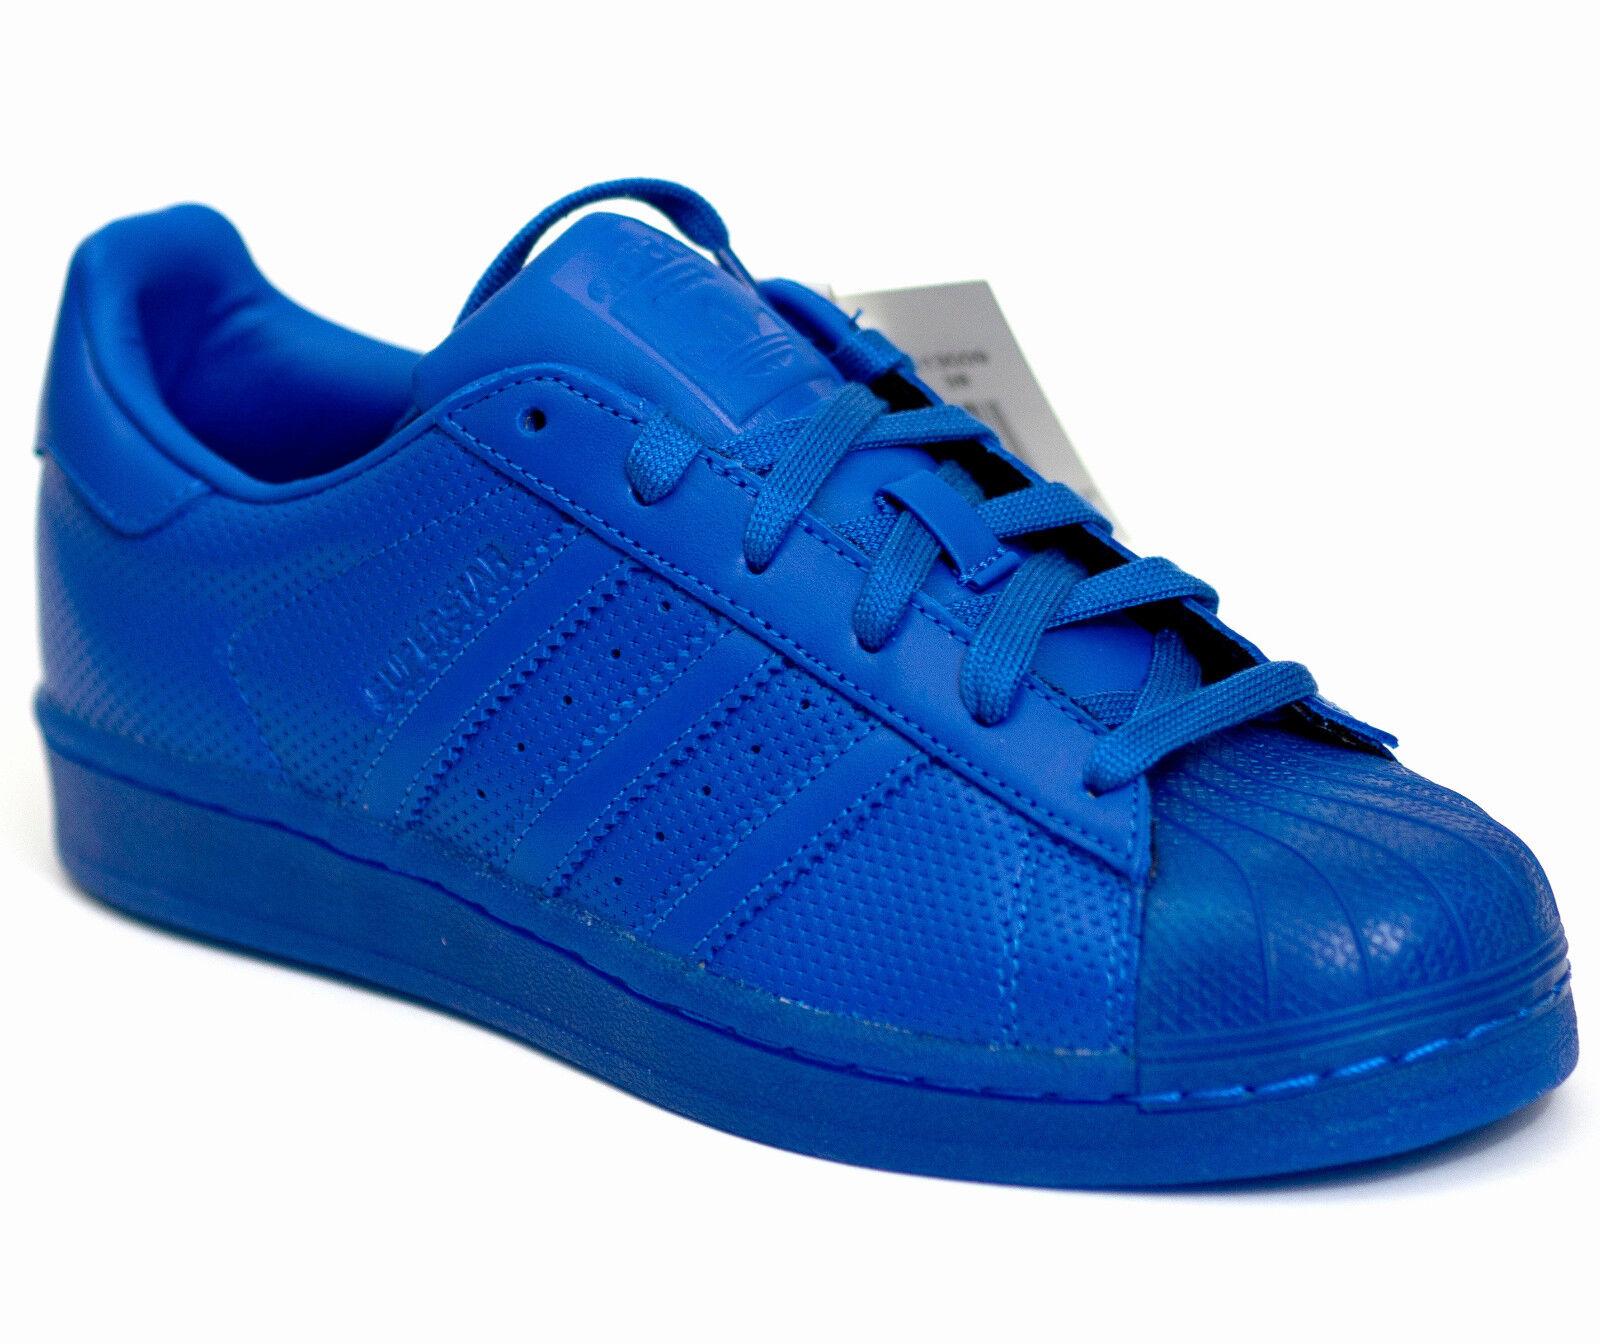 Adidas Originals Superstar Adicolor 38 Low Sneaker Turnschuhe Leder Mix blue NEU